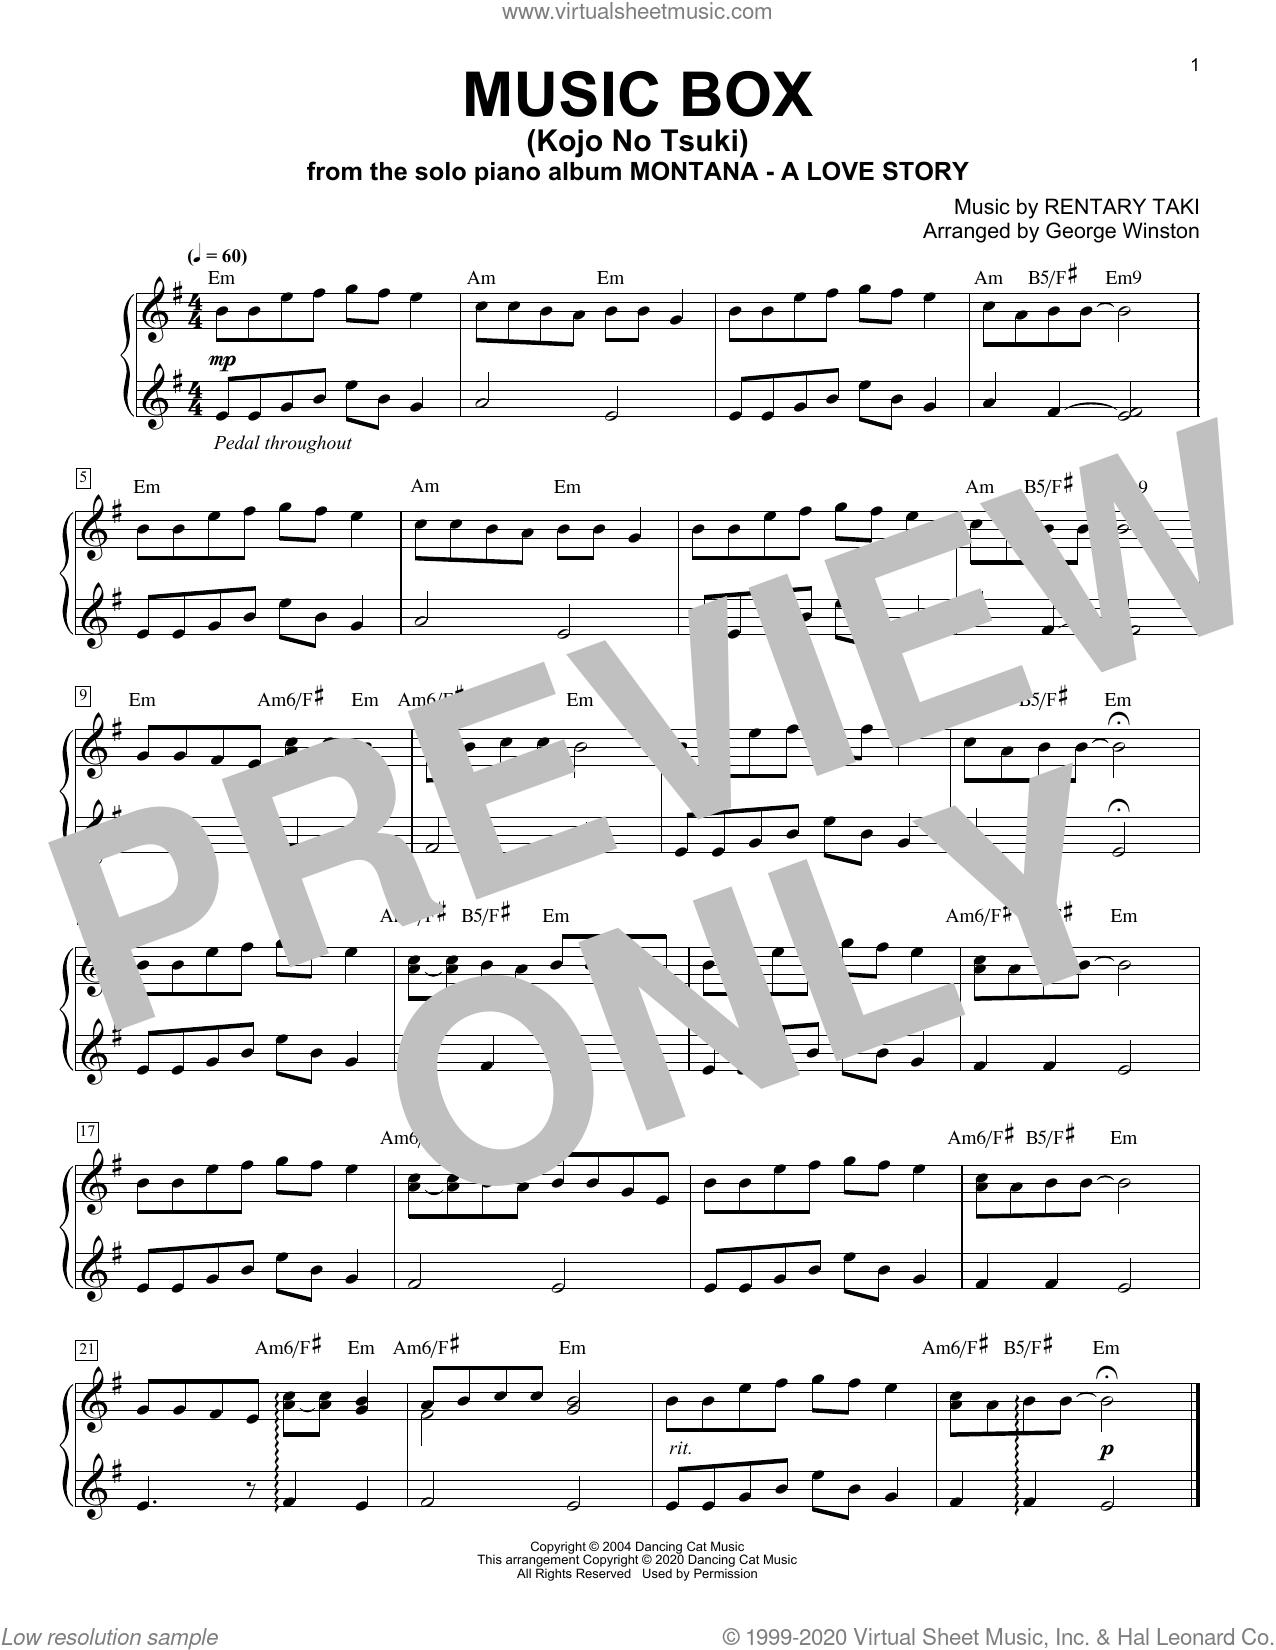 Music Box (Kojo No Tsuki) sheet music for piano solo by George Winston and Rentary Taki, intermediate skill level